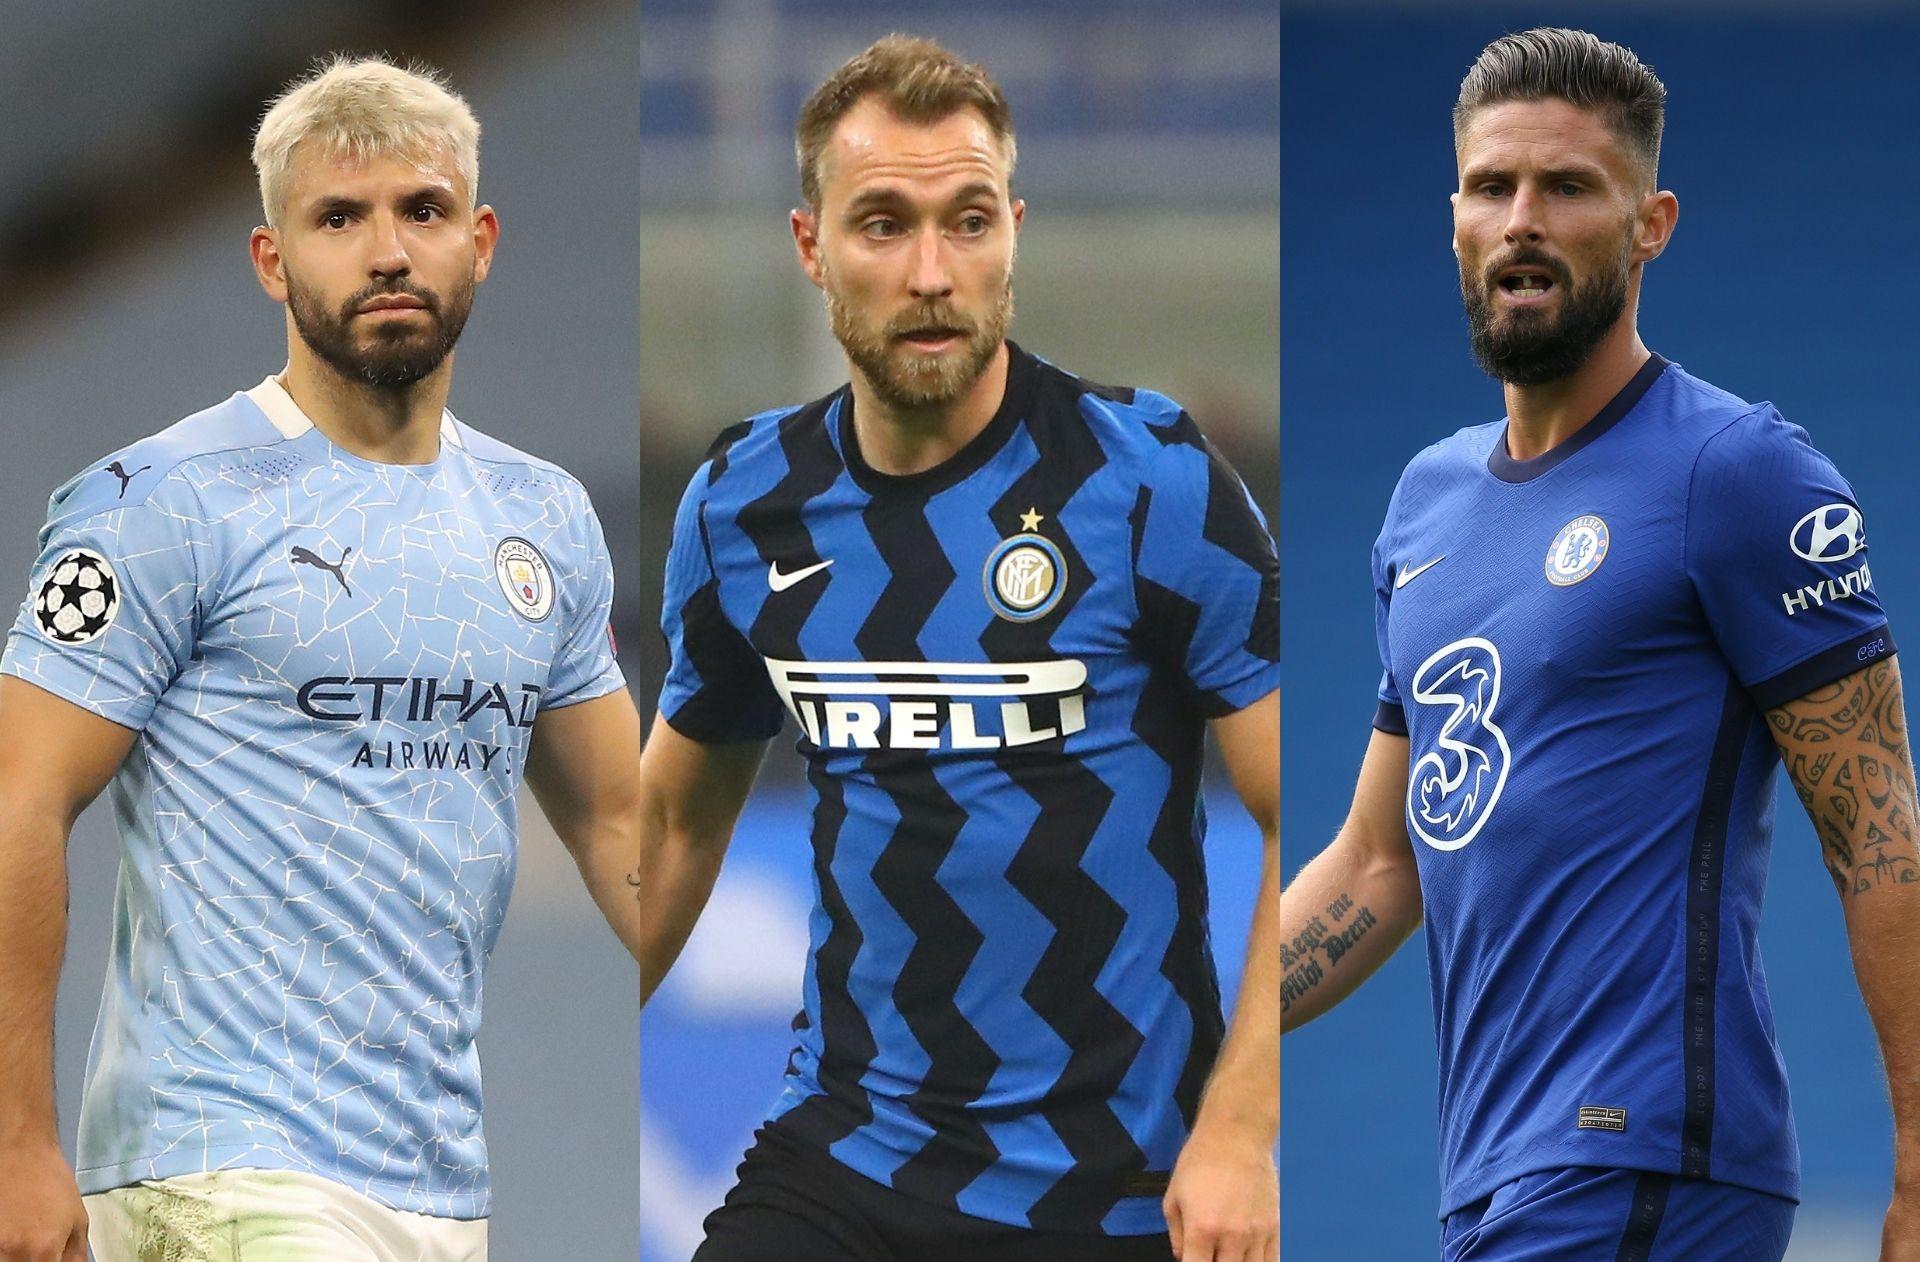 Sunday's transfer rumors - Inter to trade Eriksen for Fred?